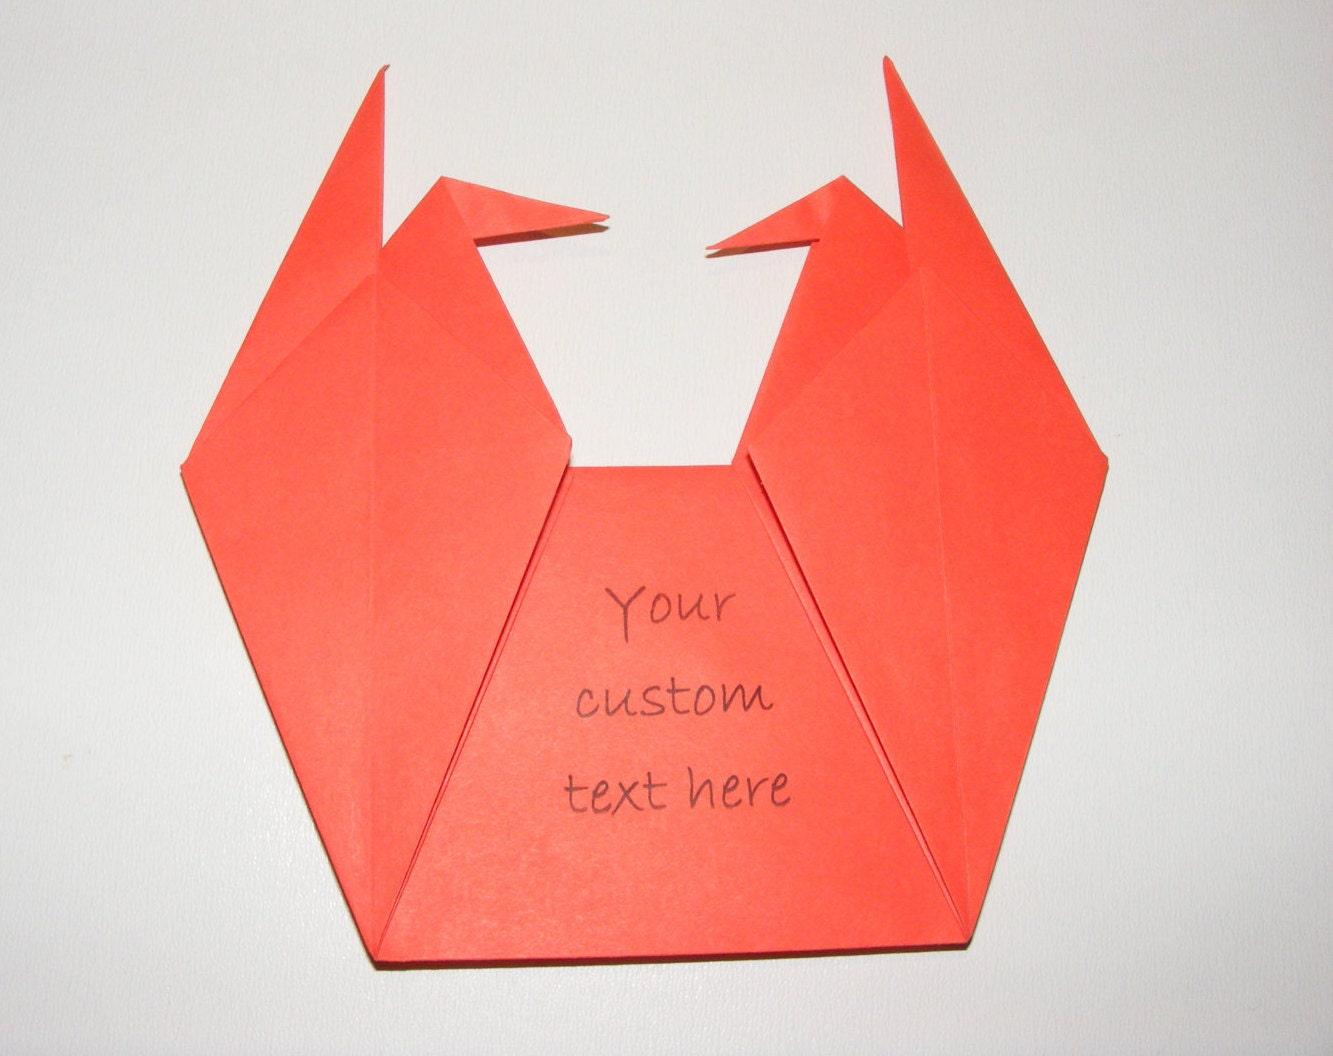 Origami envelope for wedding invitation Envelope for baby